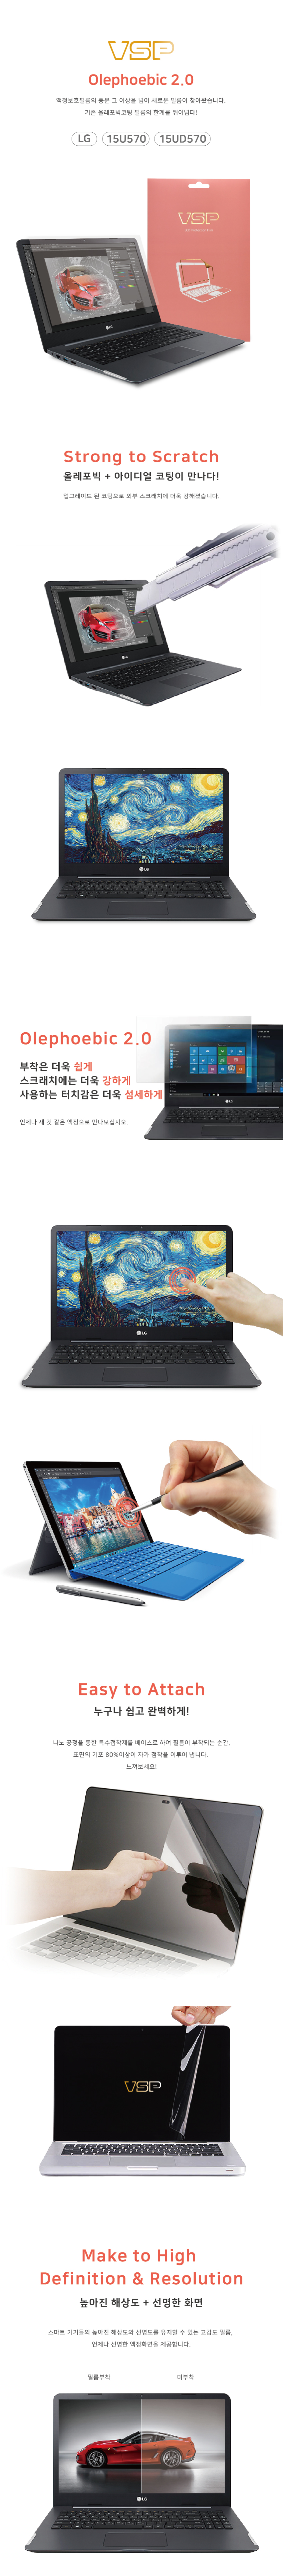 LG울트라PC 2017 LG 15U570 15UD570 올레포빅 액정 보호필름 - 뷰에스피, 20,000원, 노트북 액정보호필름, 14~15인치